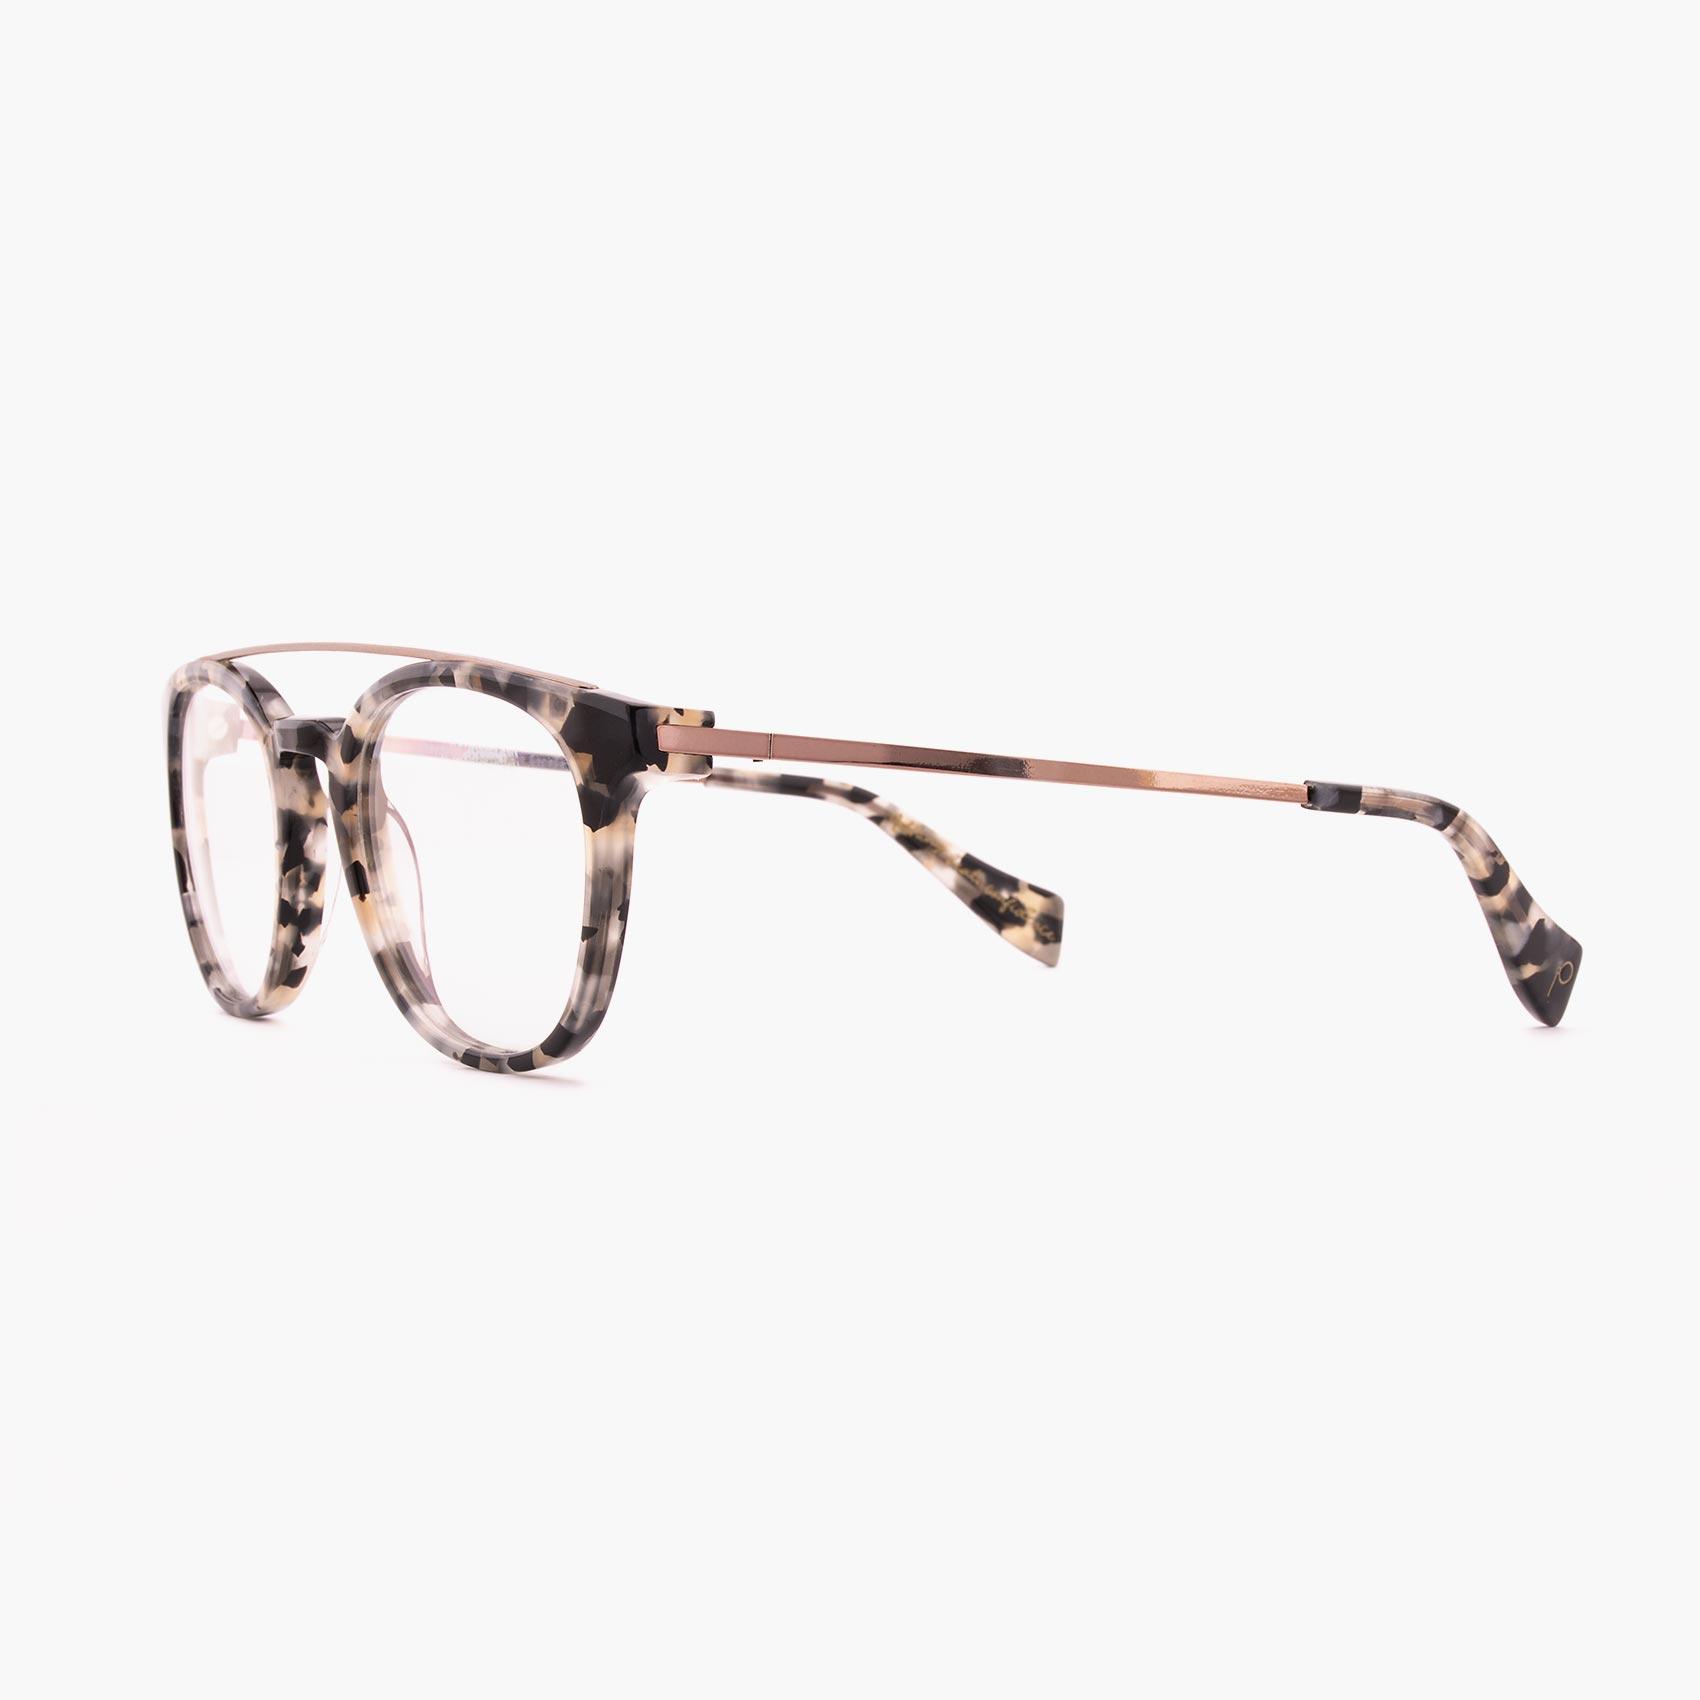 Proud eyewear Hilary C2 L montura gafas mujer puente doble